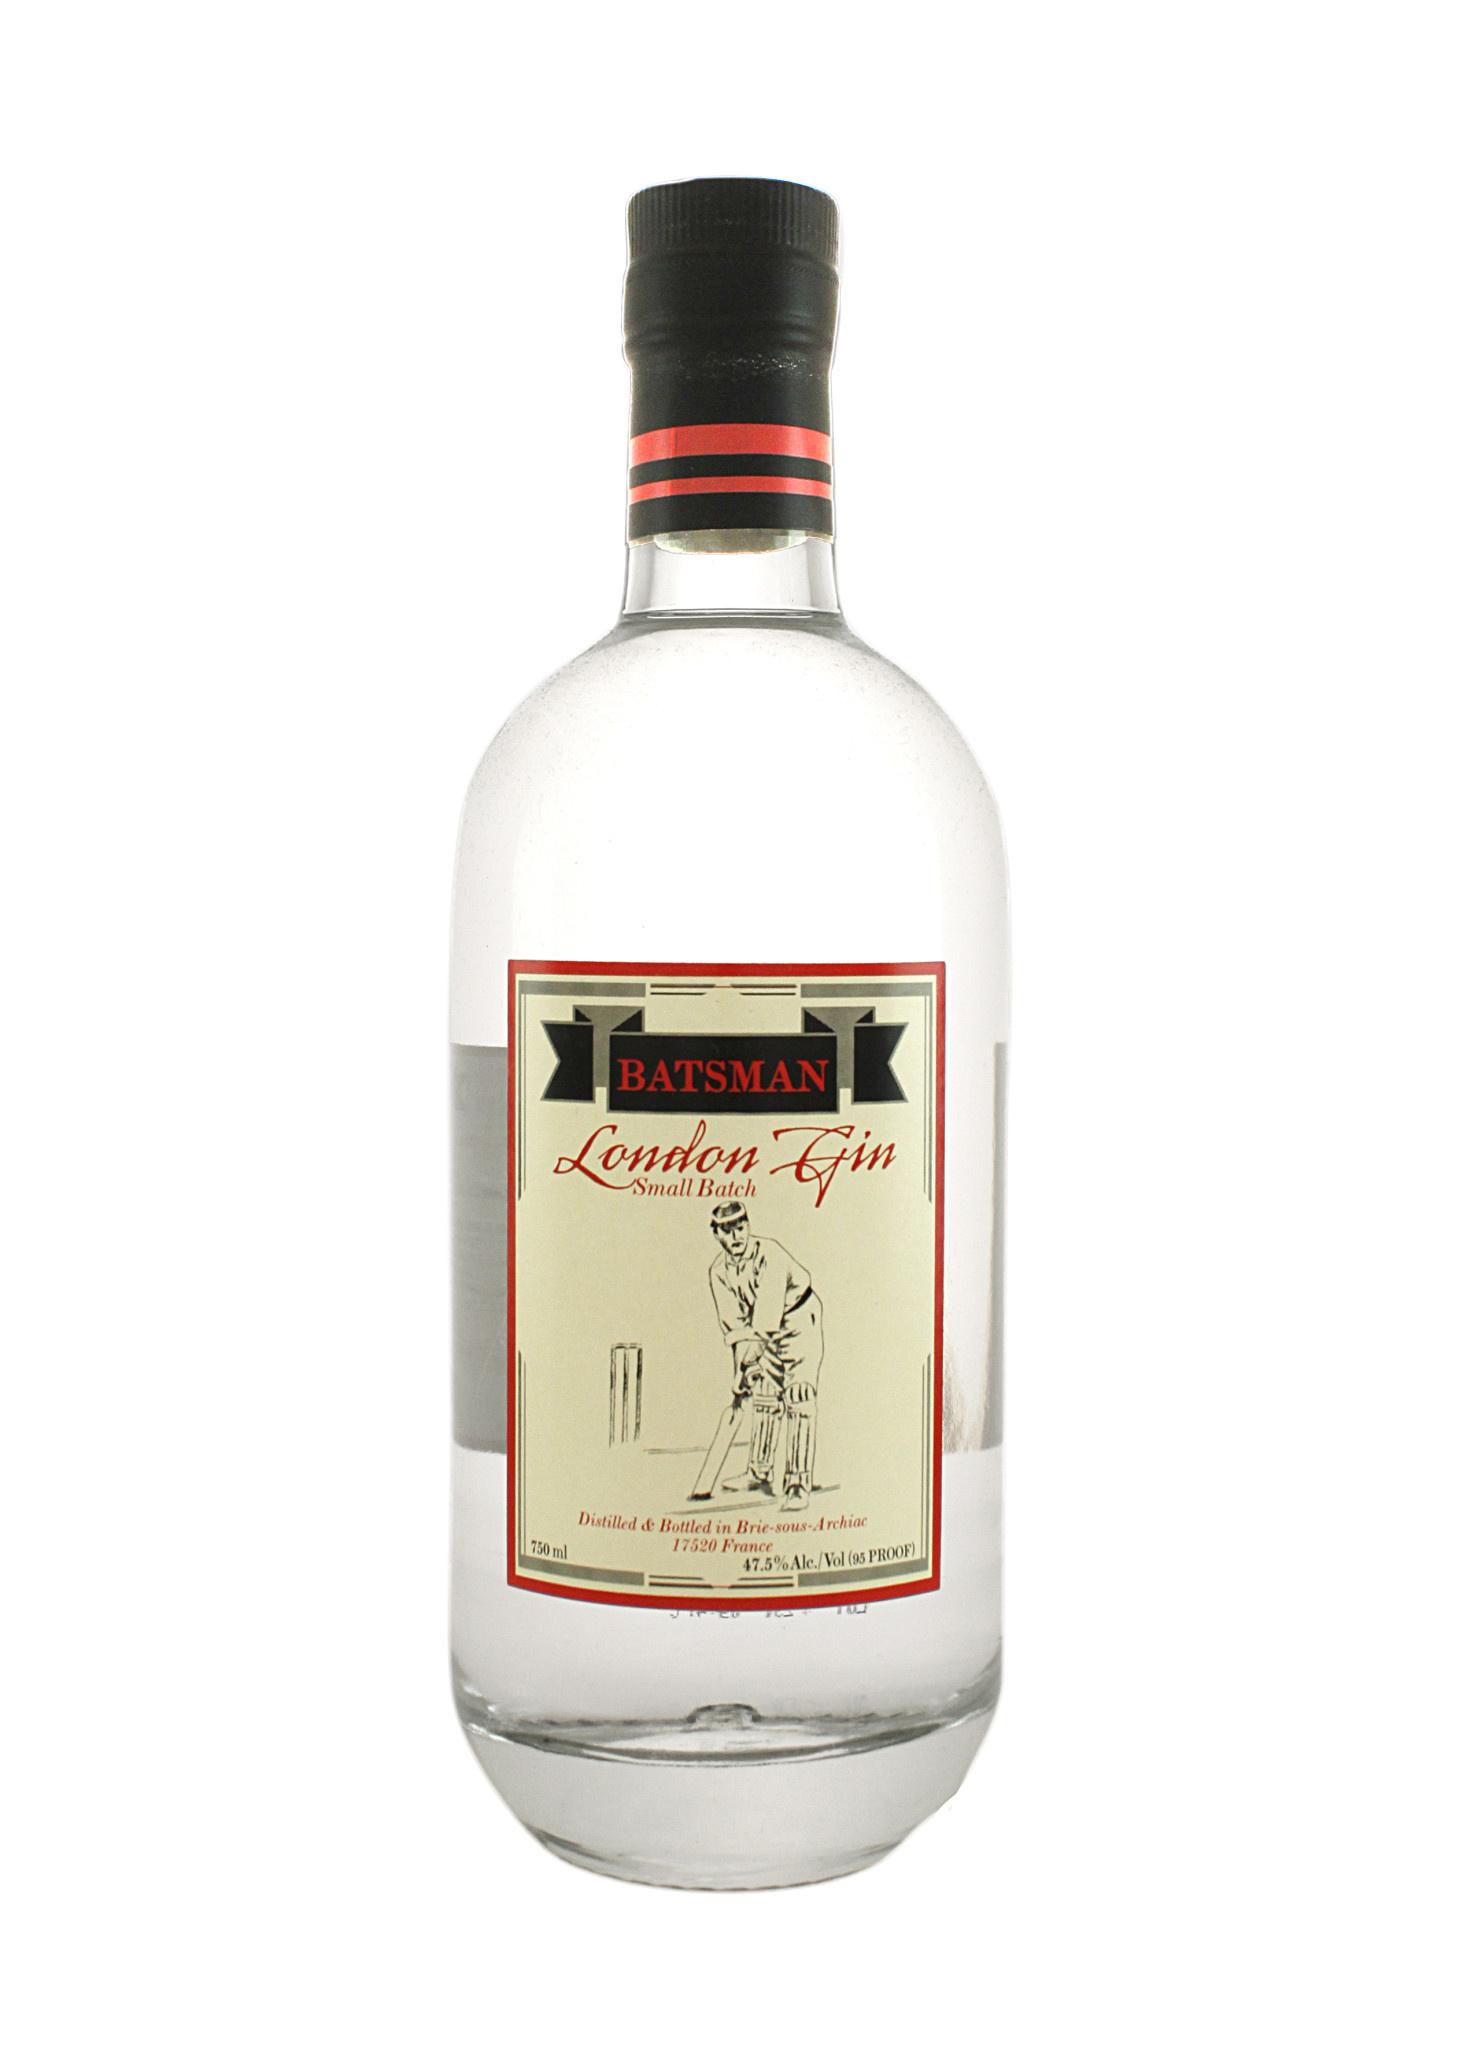 Batsman London Gin